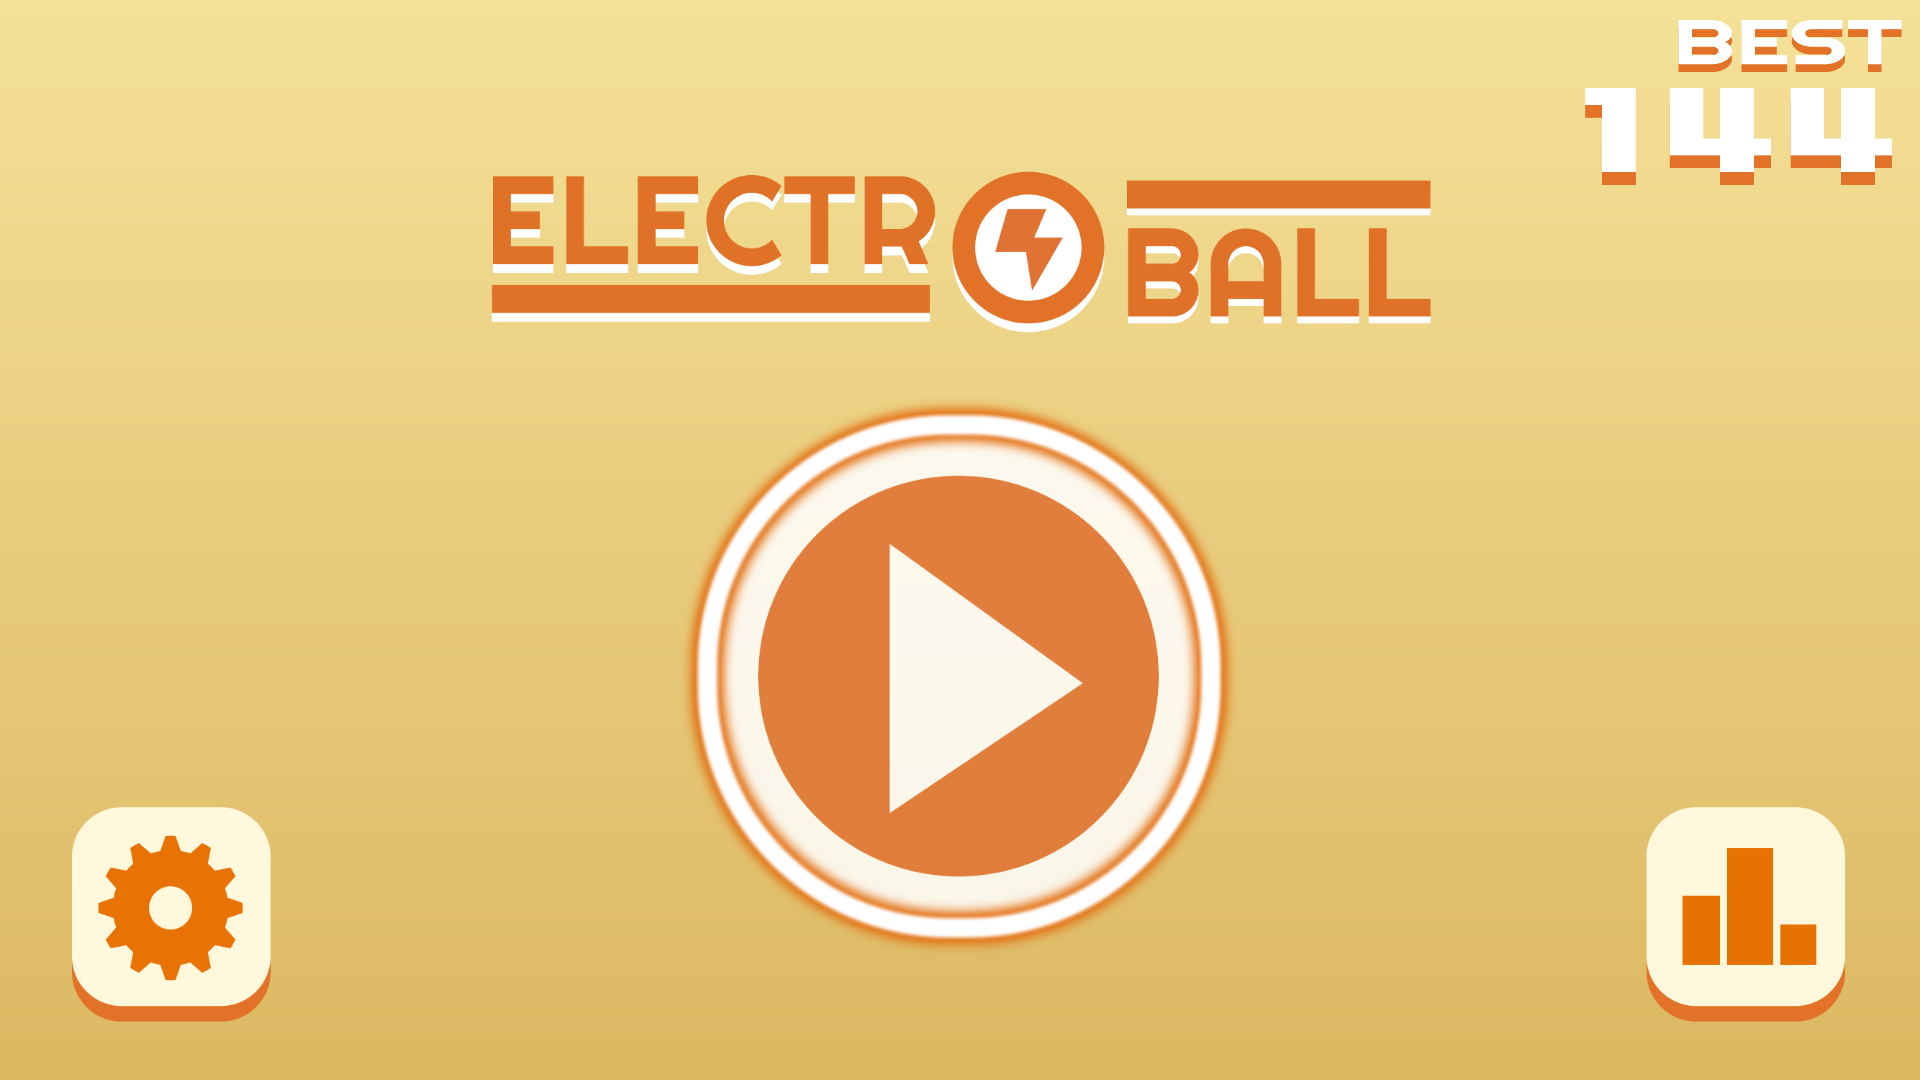 Electro Ball - Avoid the Shocks! screenshot 10